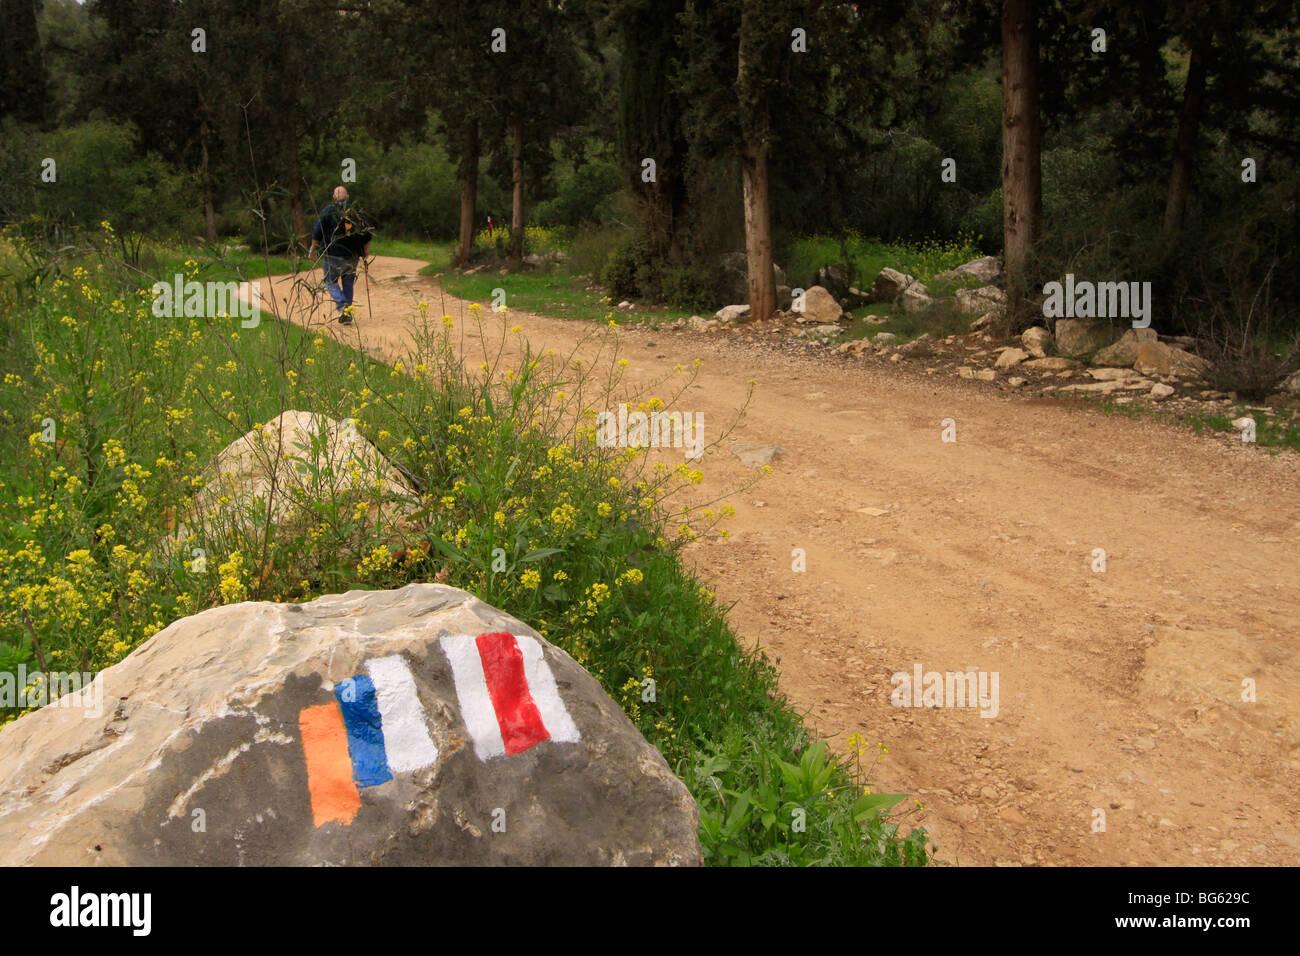 Israel, Jerusalem Mountains, Israel Trail in Nahal Ksalon - Stock Image